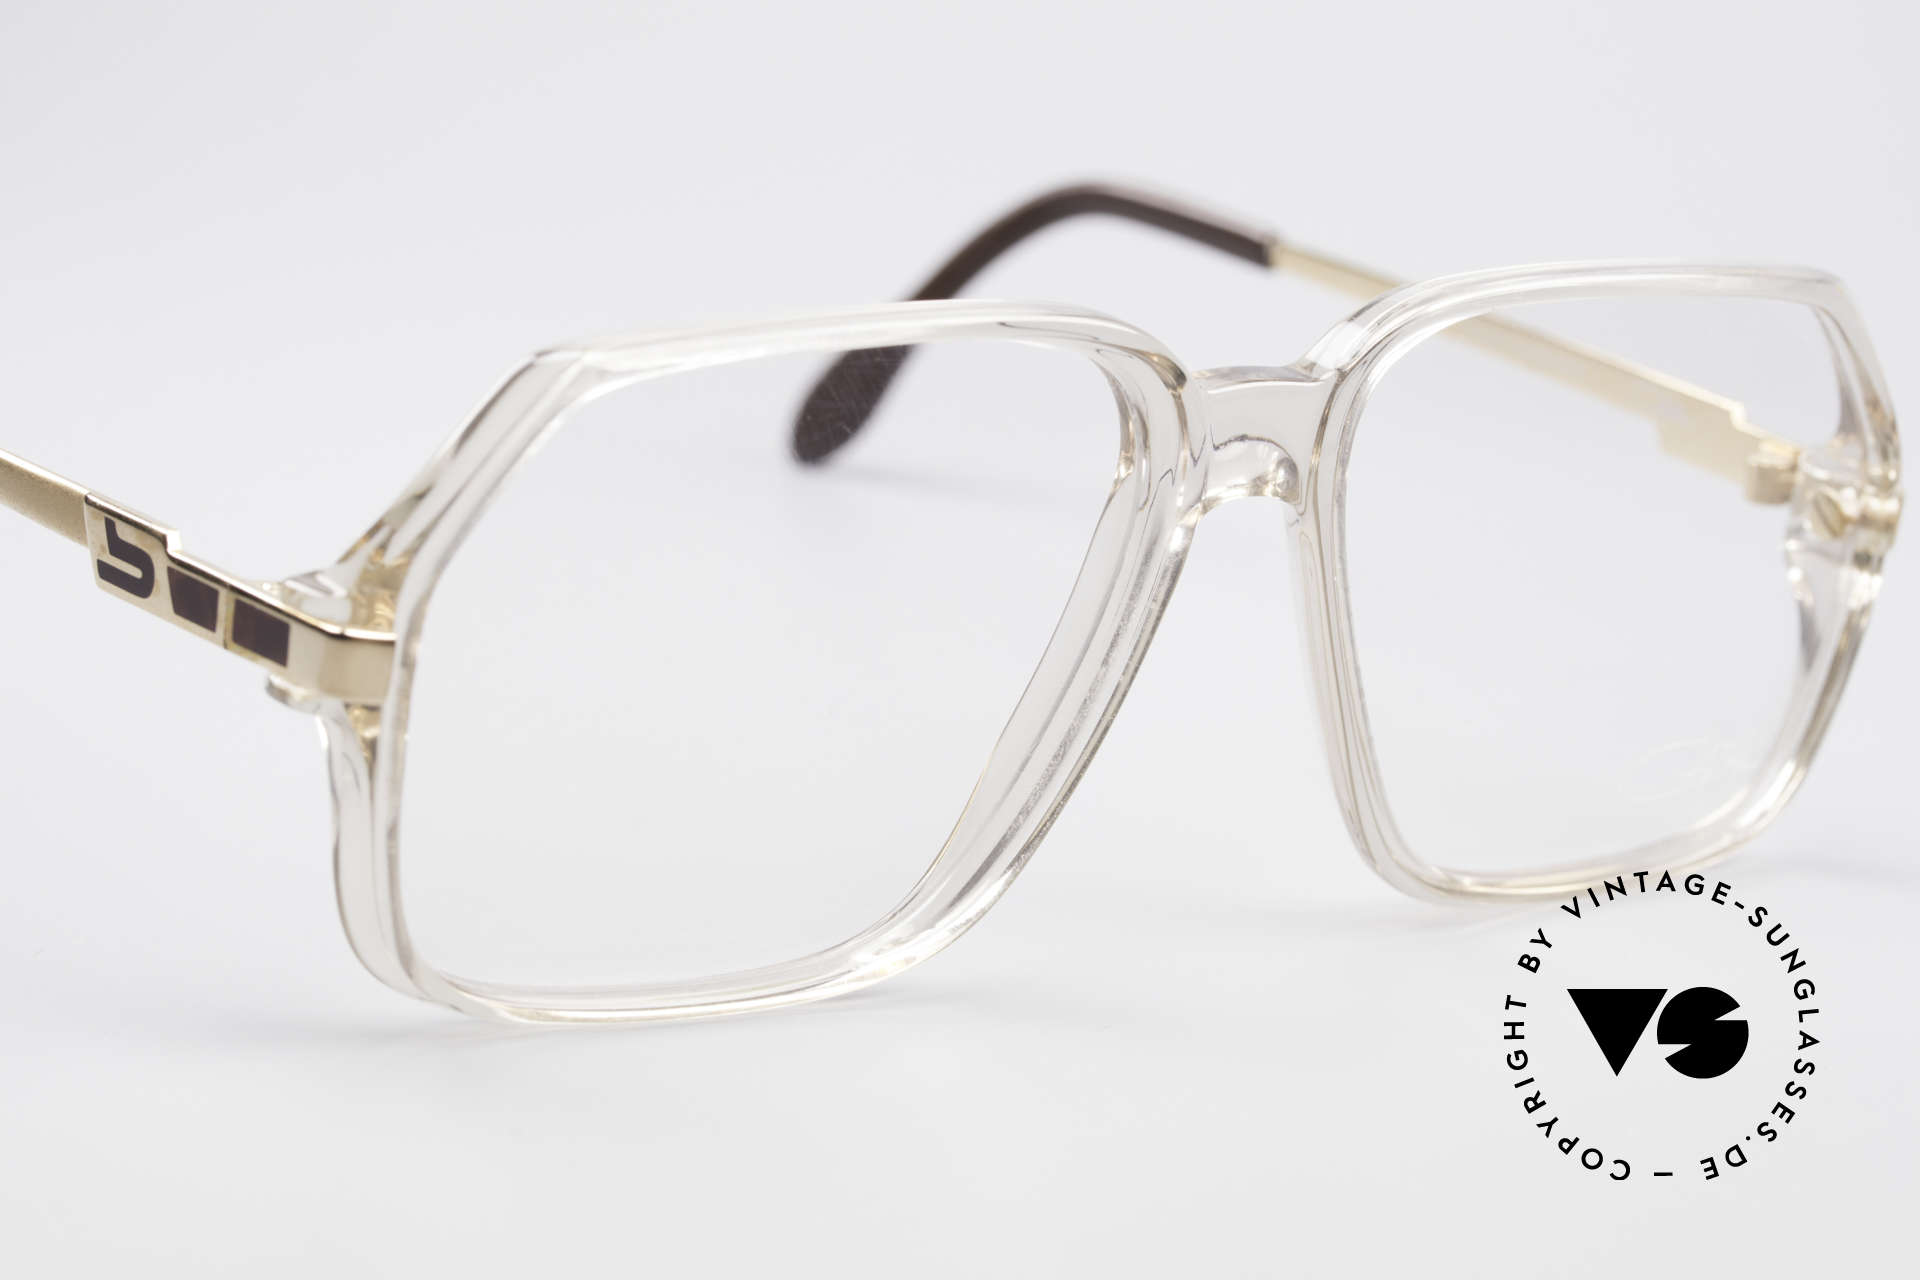 Cazal 625 West Germany 80's Eyeglasses, NO retro eyeglass-frame, but an 'old school' original, Made for Men